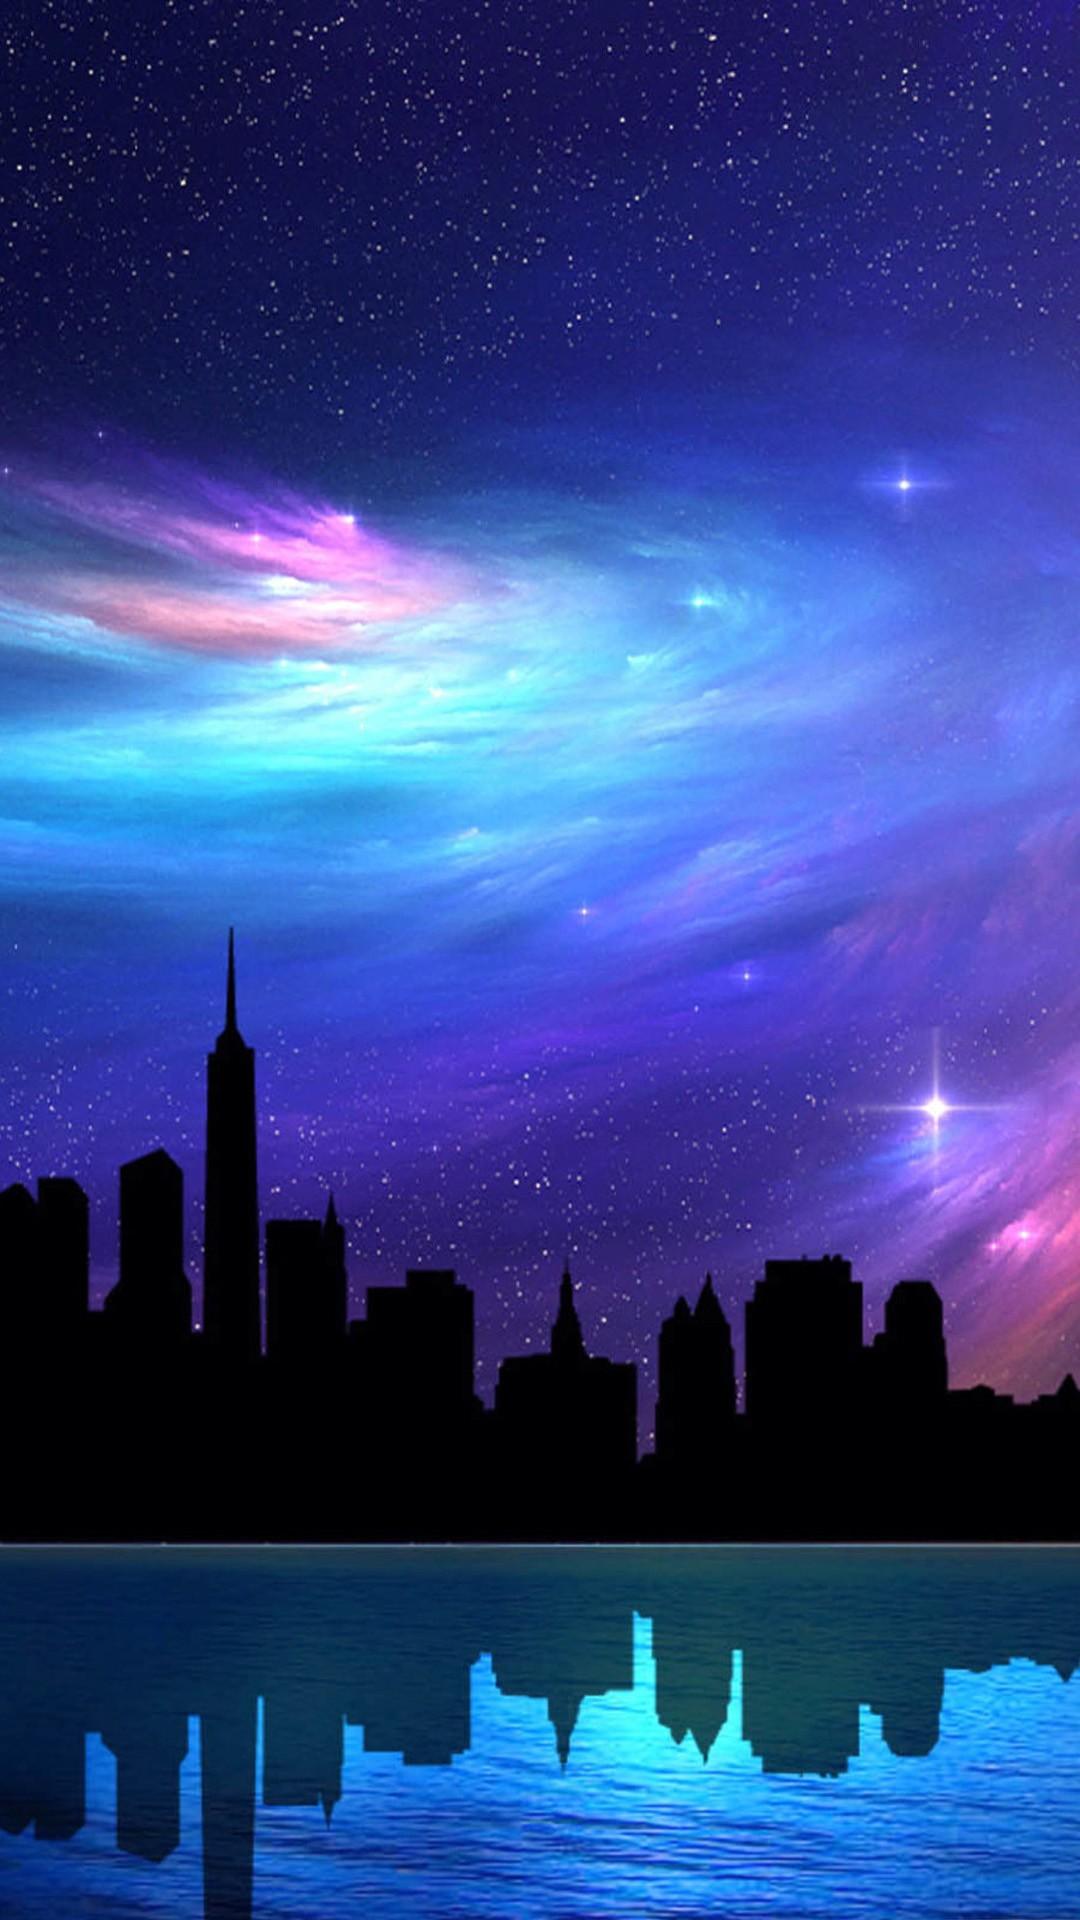 City-night-reflection-Samsung-HD-1080x1920-wallpaper-wp3403926